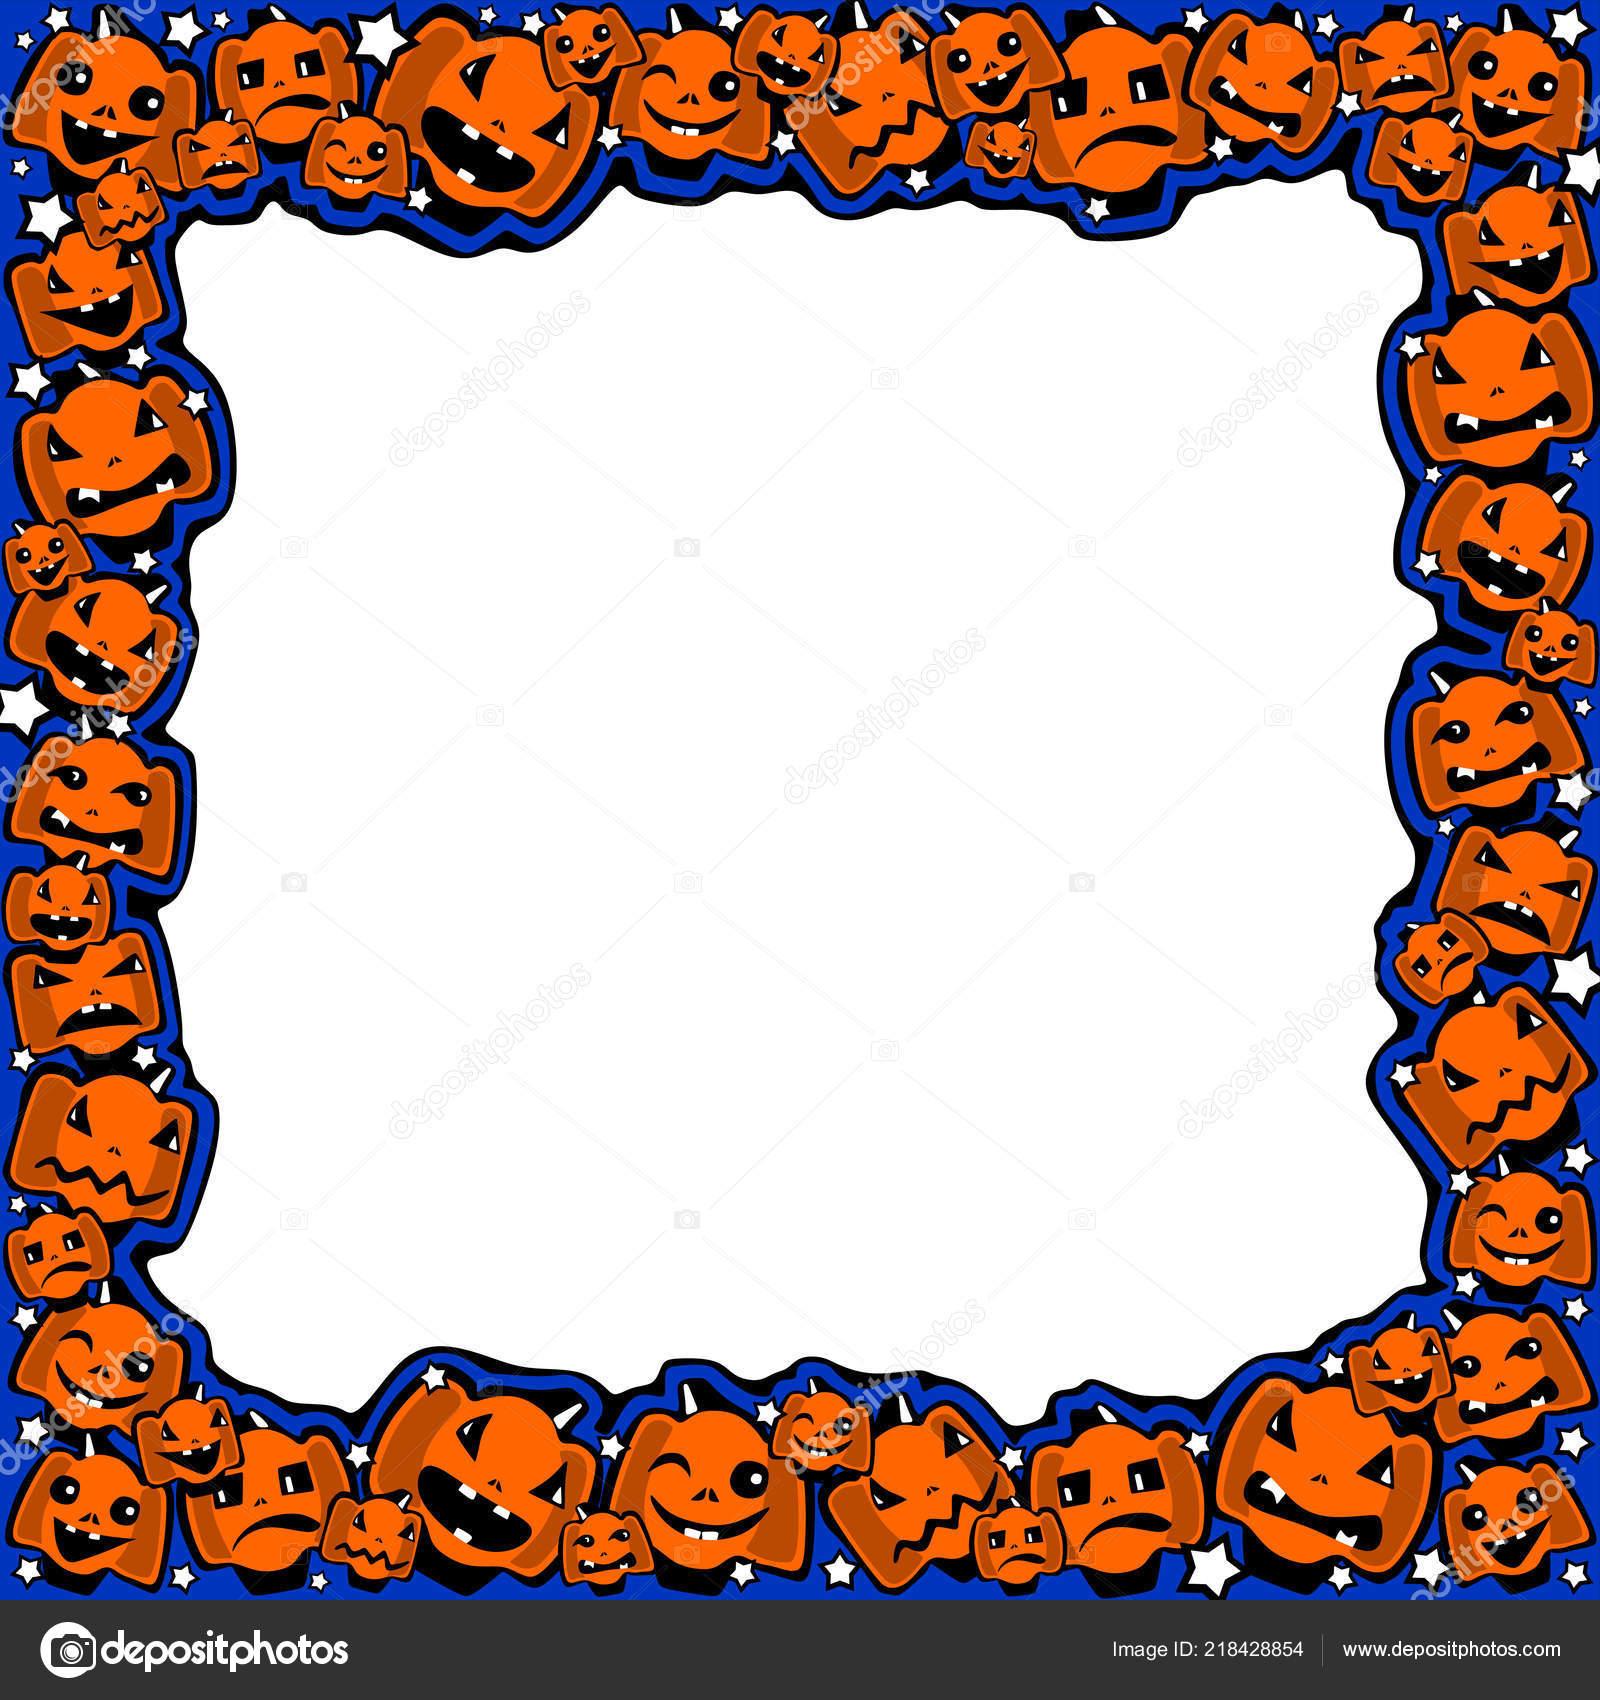 halloween frame pumpkins different emotions comical cartoon style